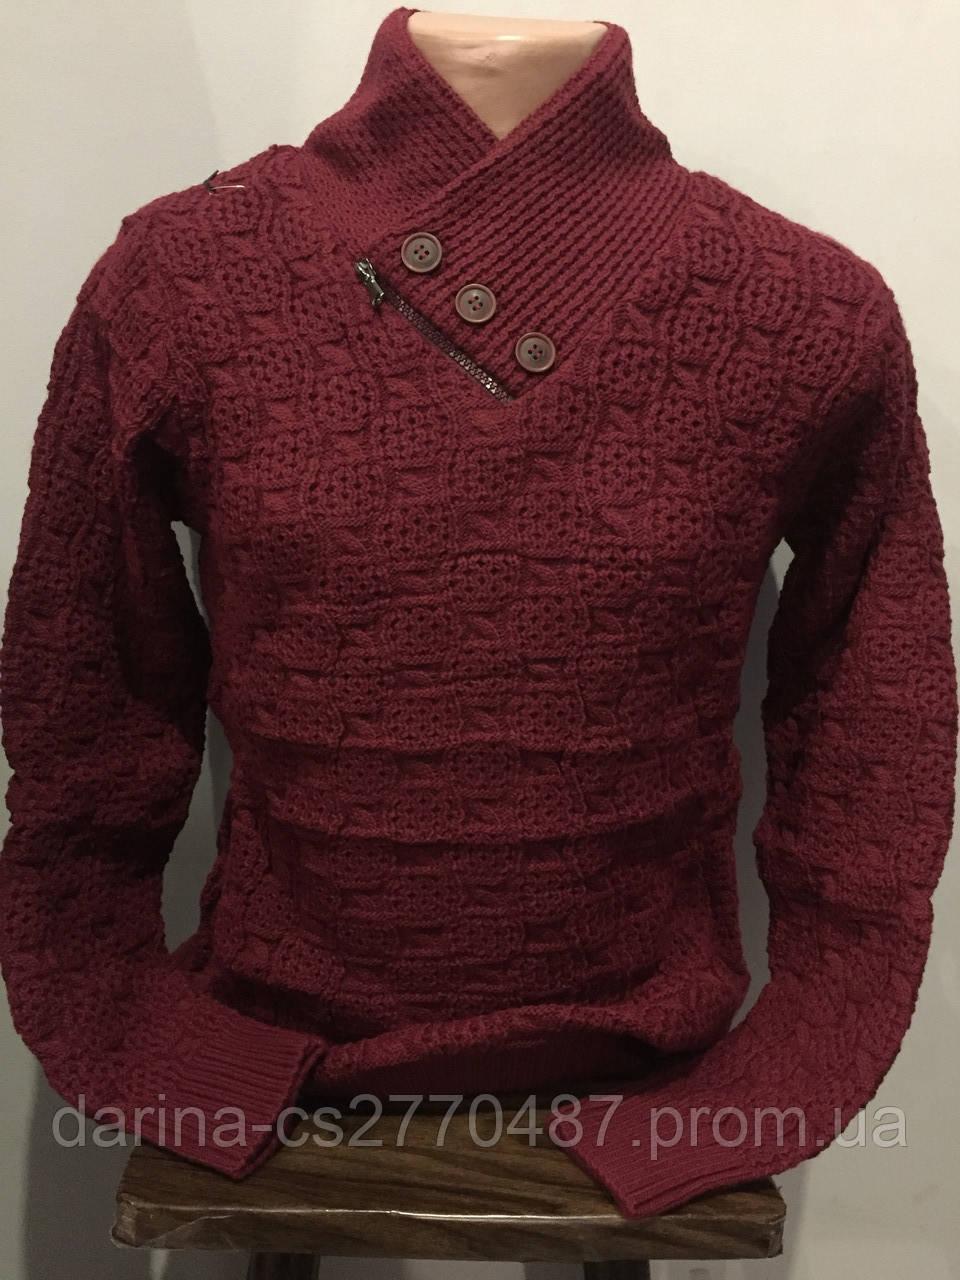 Теплый свитер для мужчины M,L,XL